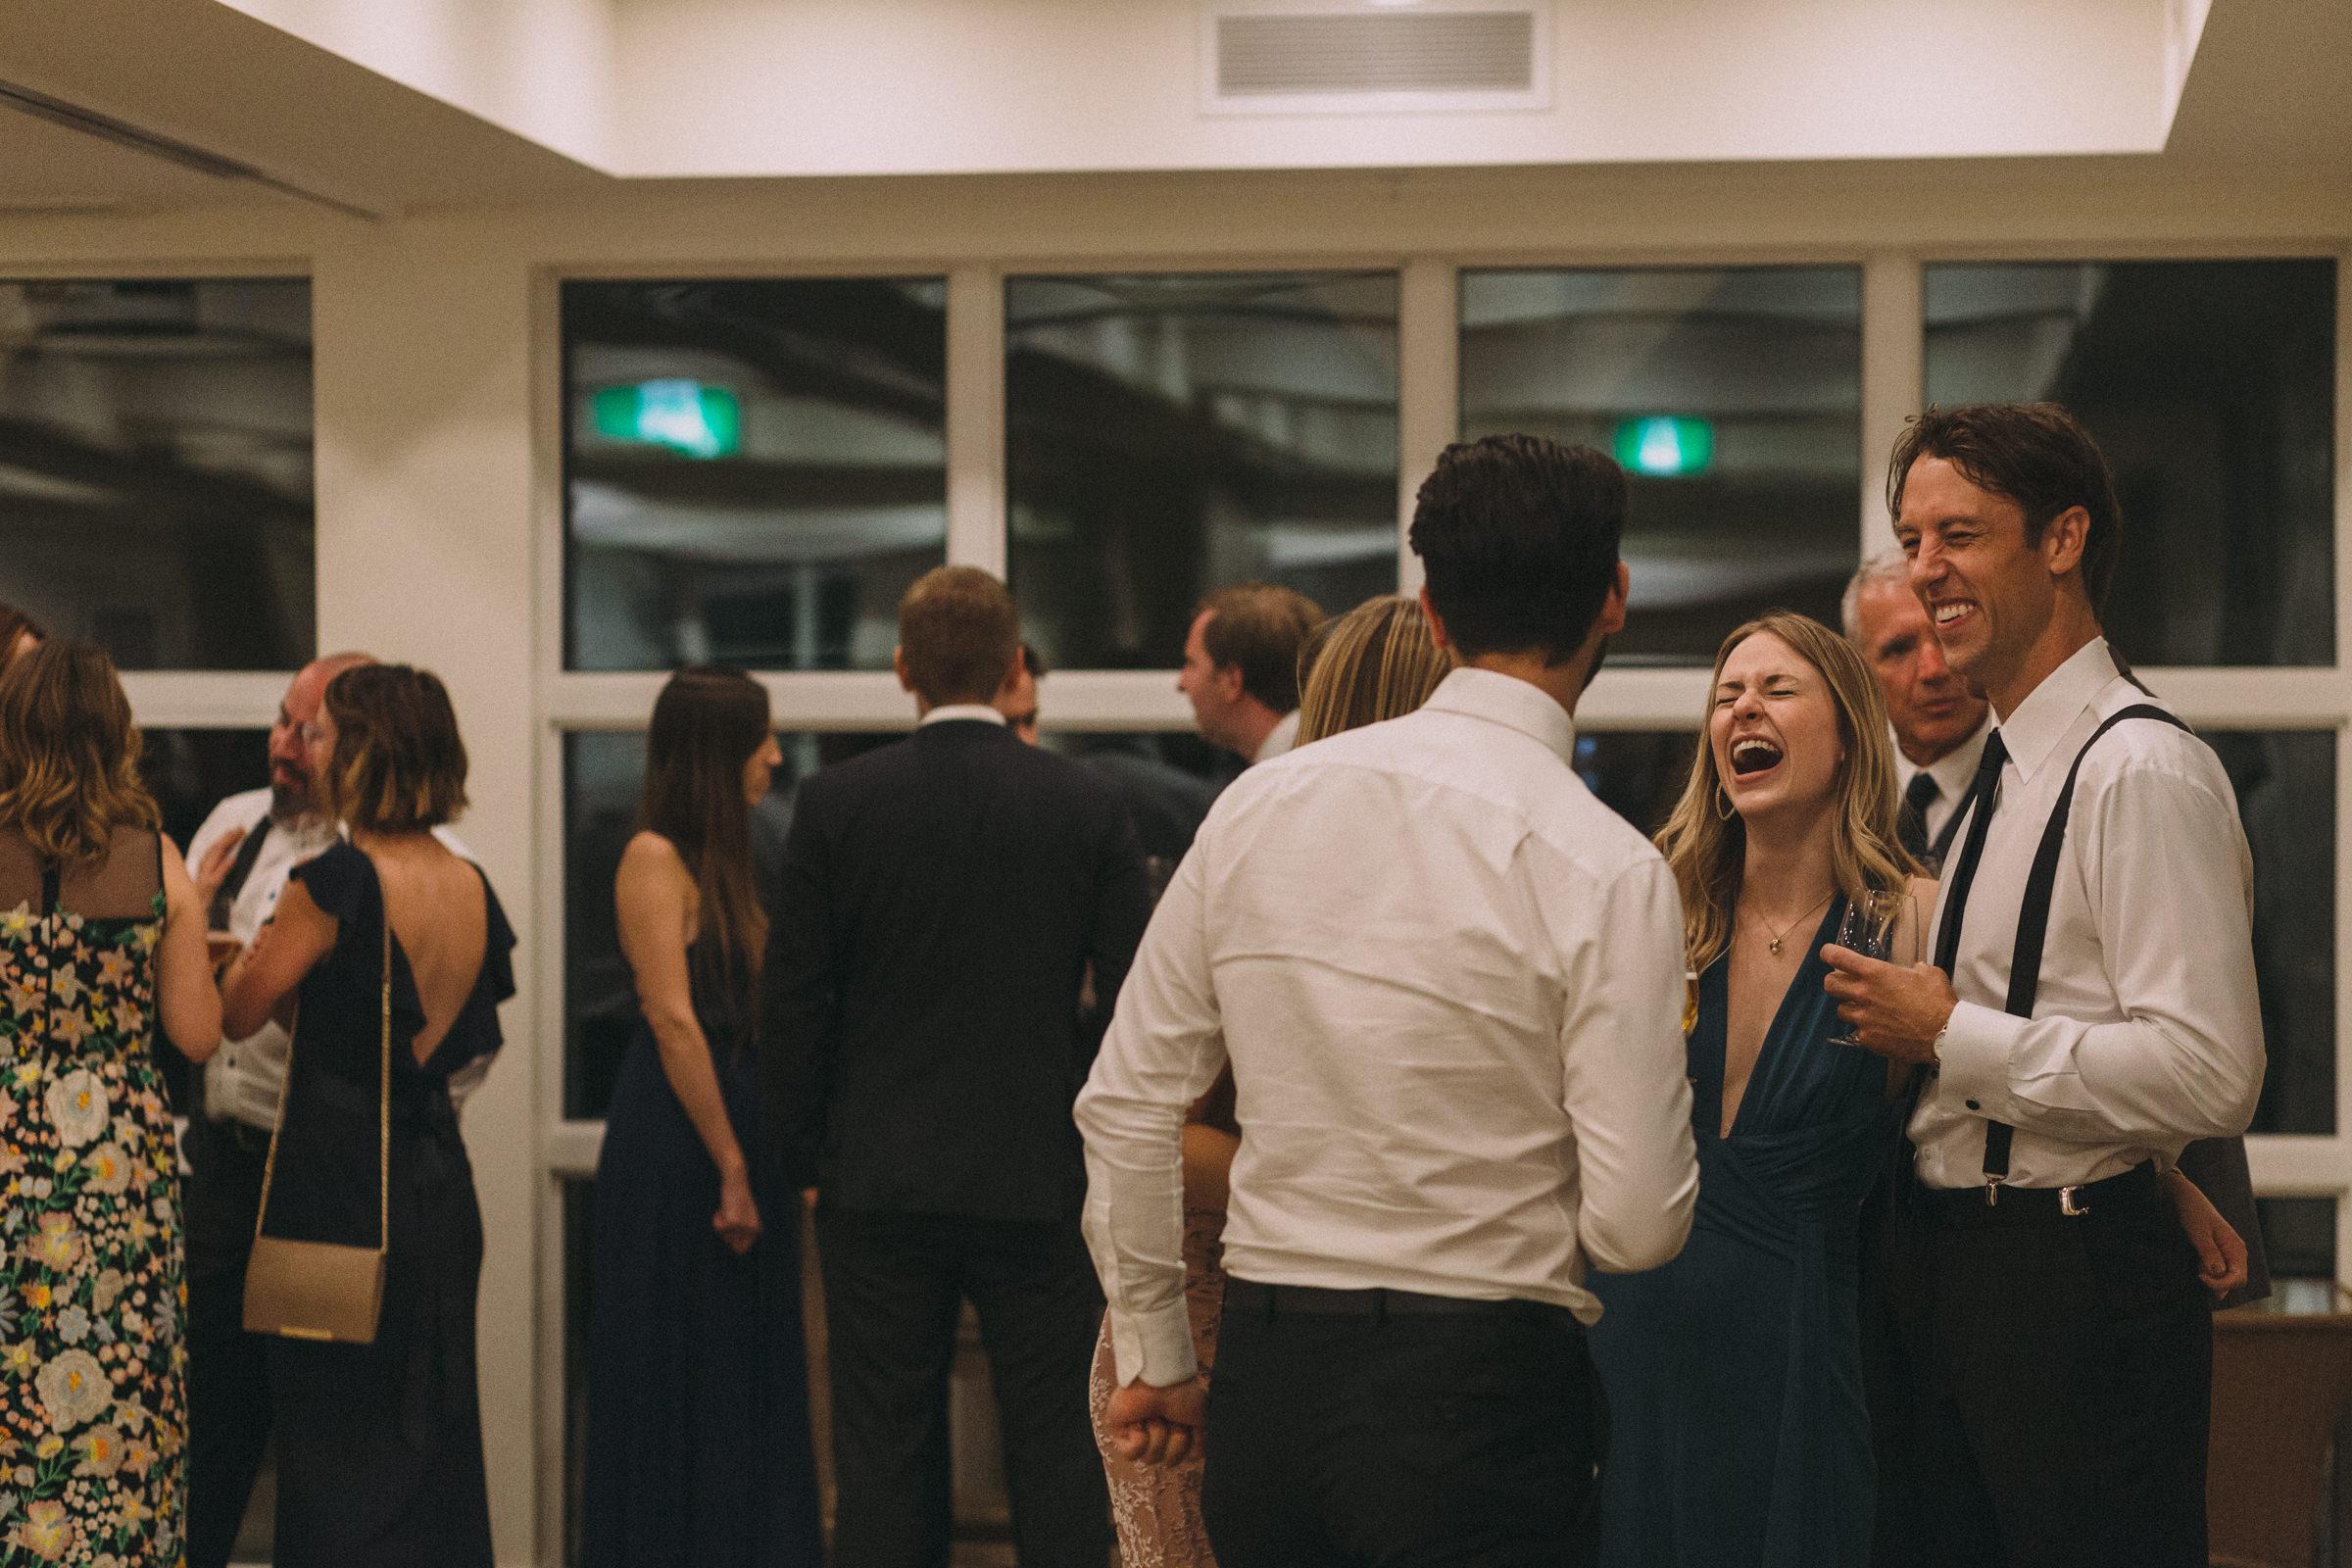 Langdon-Hall-wedding-photography-Cambridge-by-Sam-Wong-of-Visual-Cravings_Sarah-Ryan_53.jpg